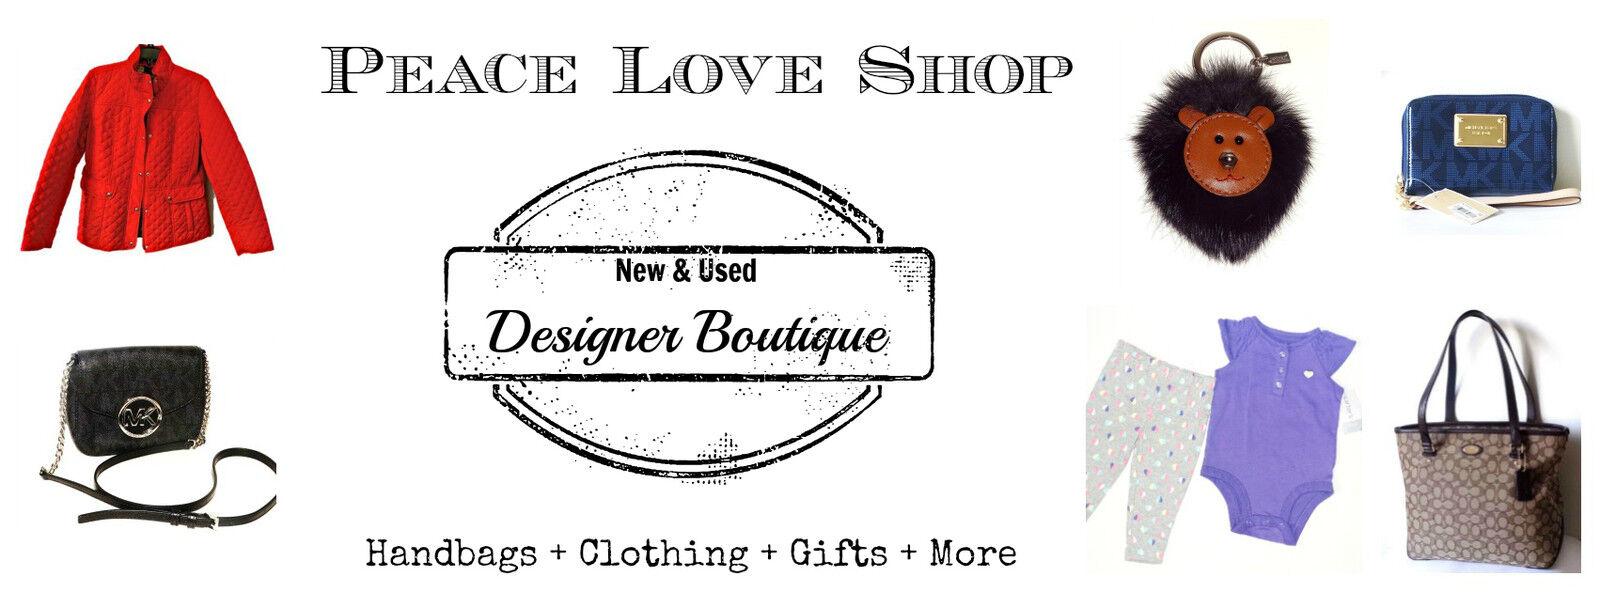 PLS Designer Boutique